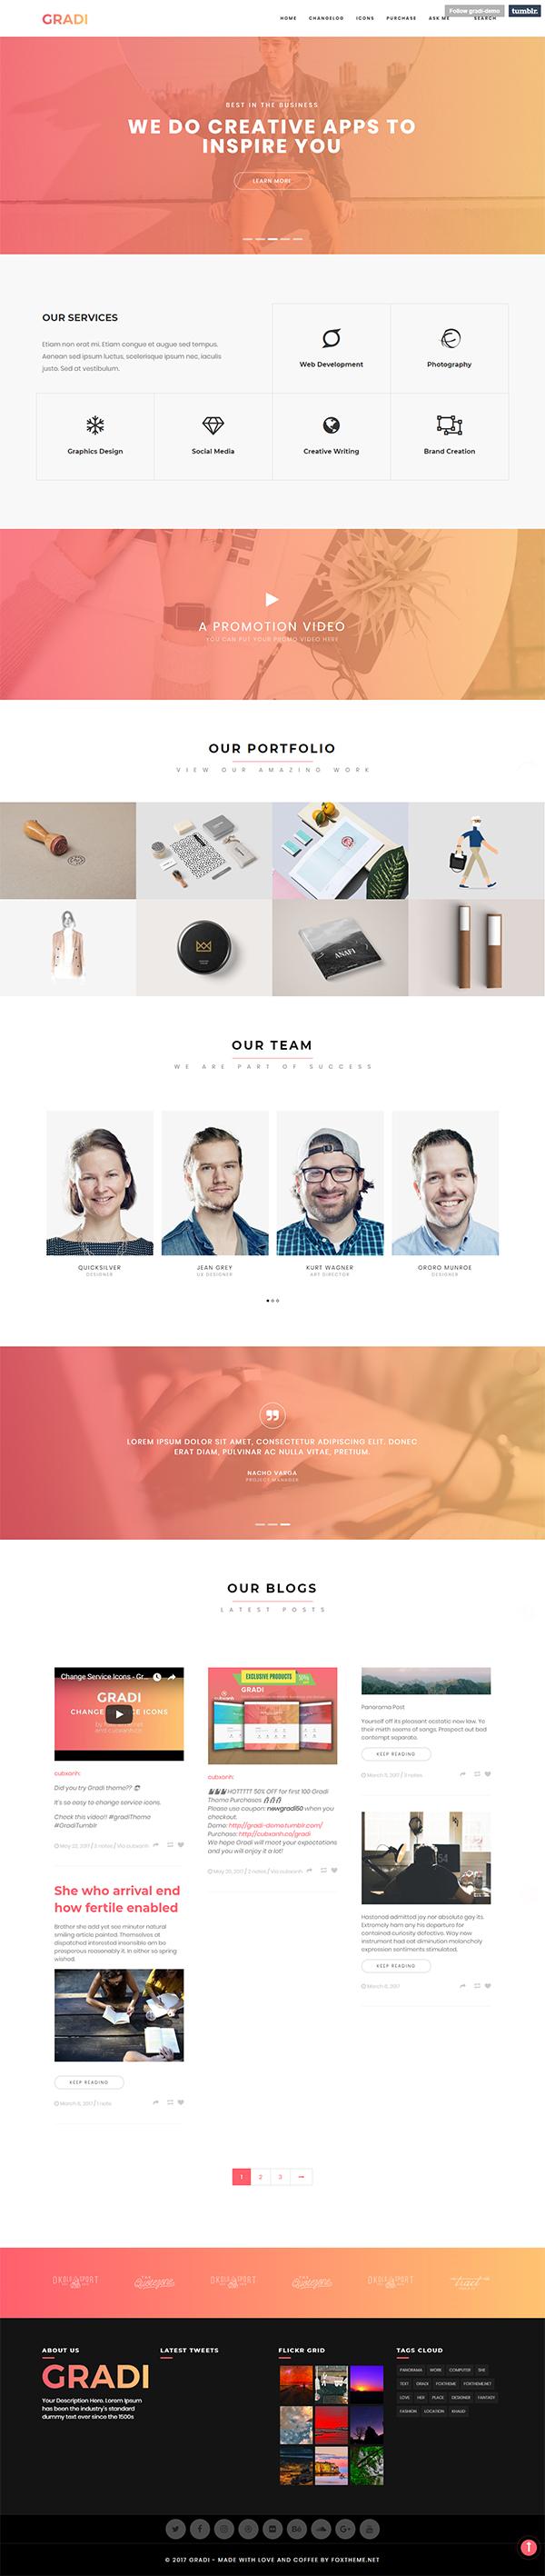 Gradi - Fresh Tumblr Theme for Modern Businesses and Startups